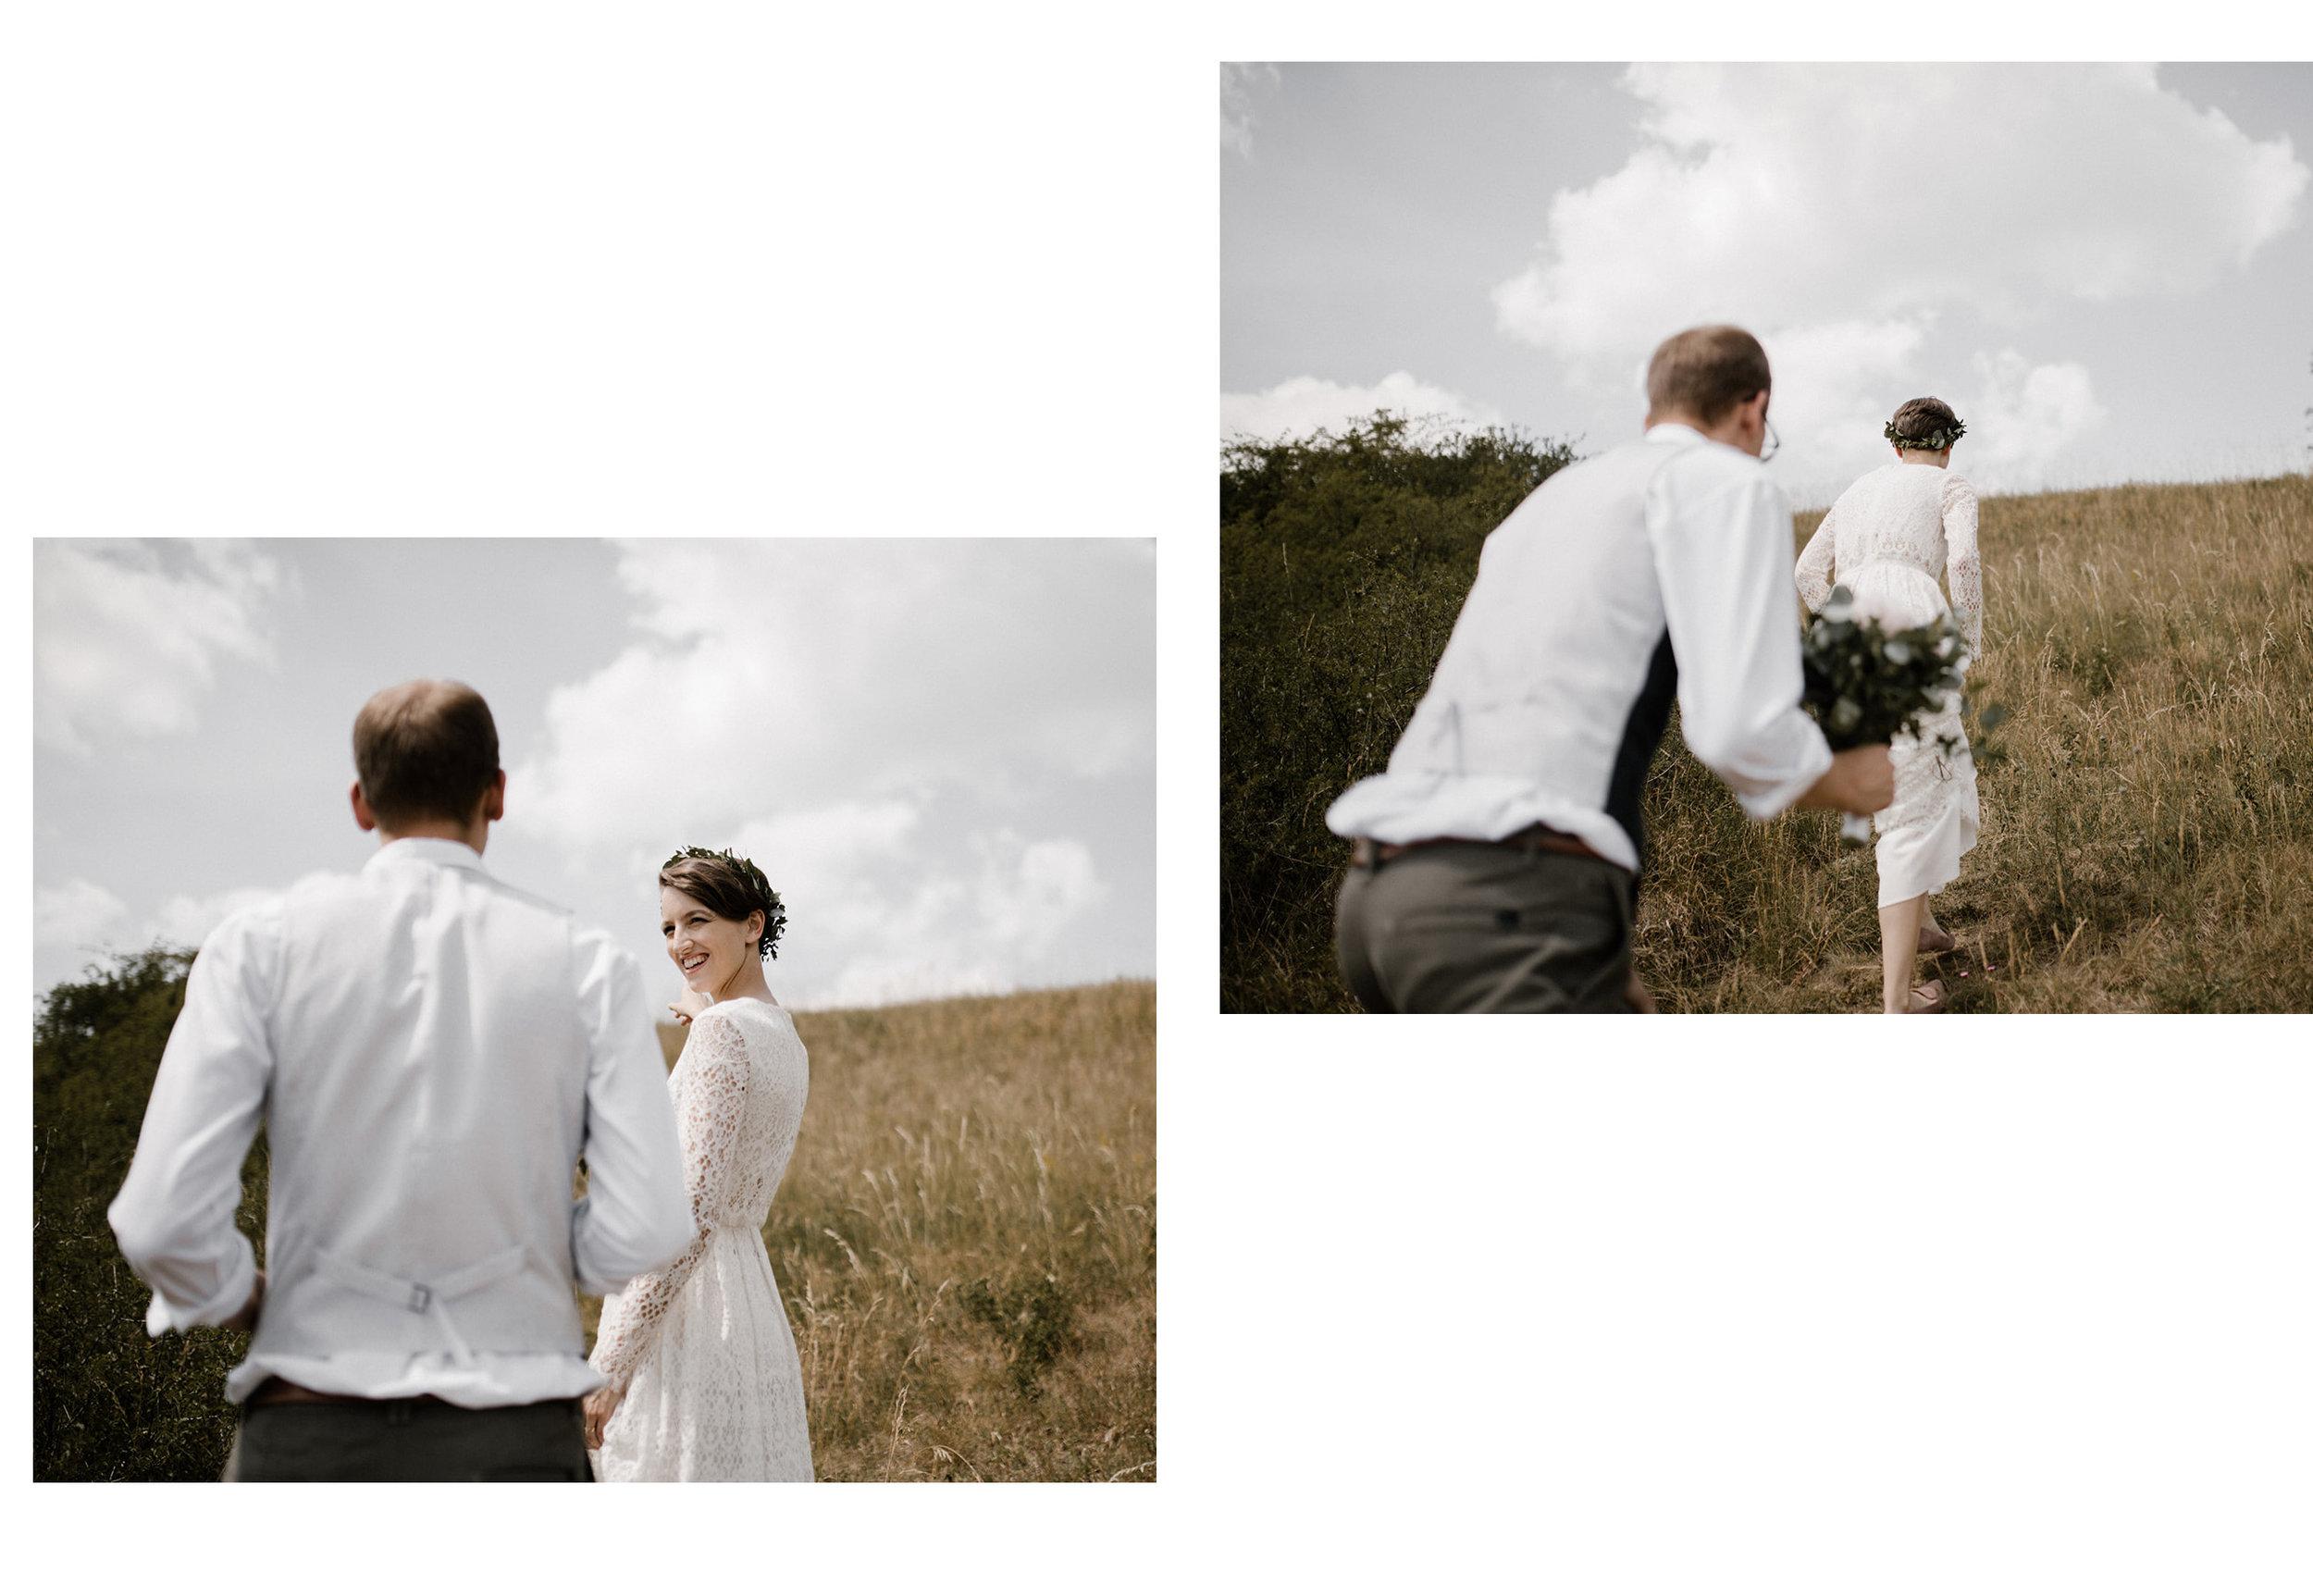 Jaja_Josh_wedding-422.jpg